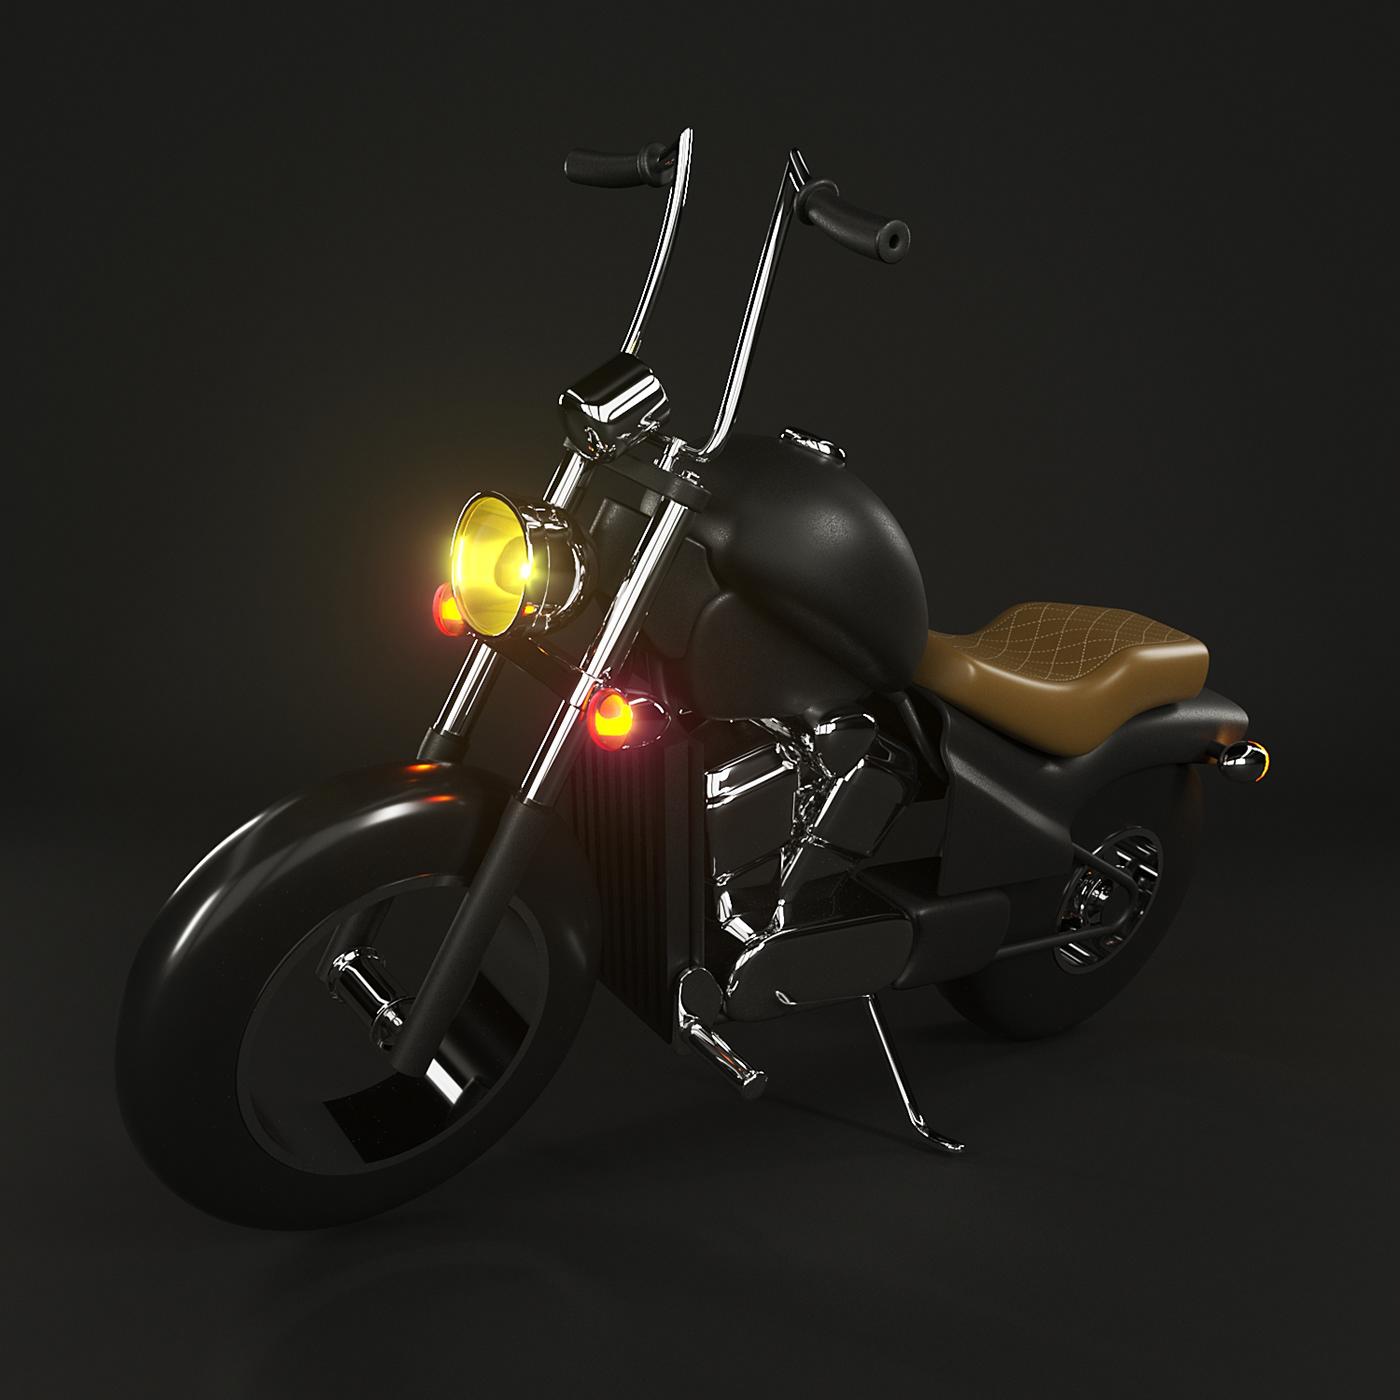 beard Character Custom mascote moto motorcycle personagem shadow